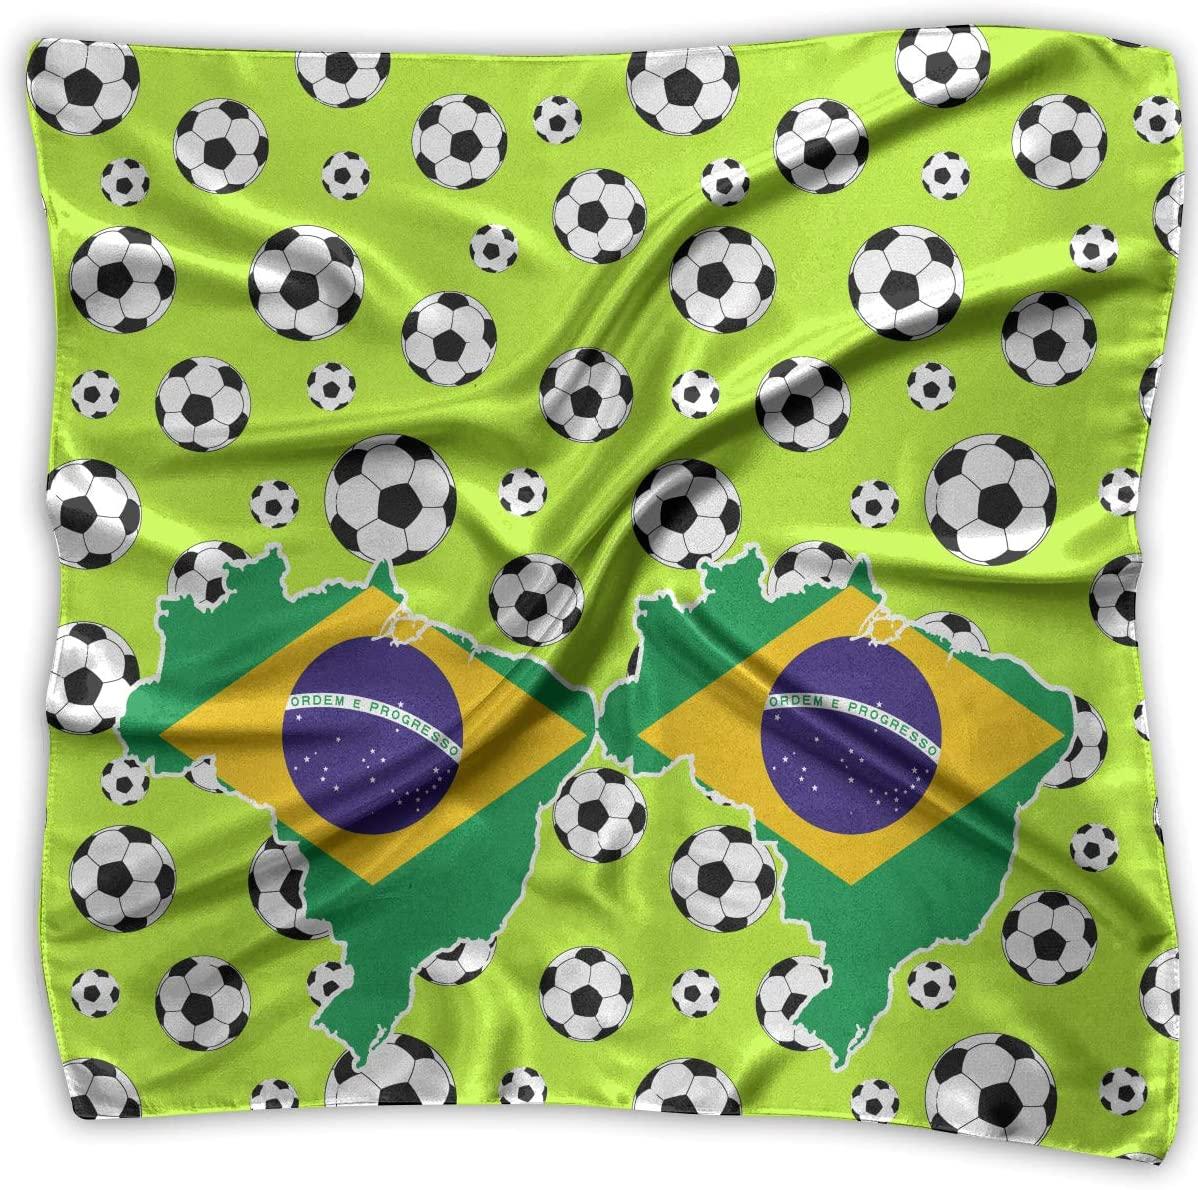 WFIRE Brazilian Flag Square Handkerchiefs Scarf Shawl Bandanas Headscarf Neckerchief Tie Hair Scarf